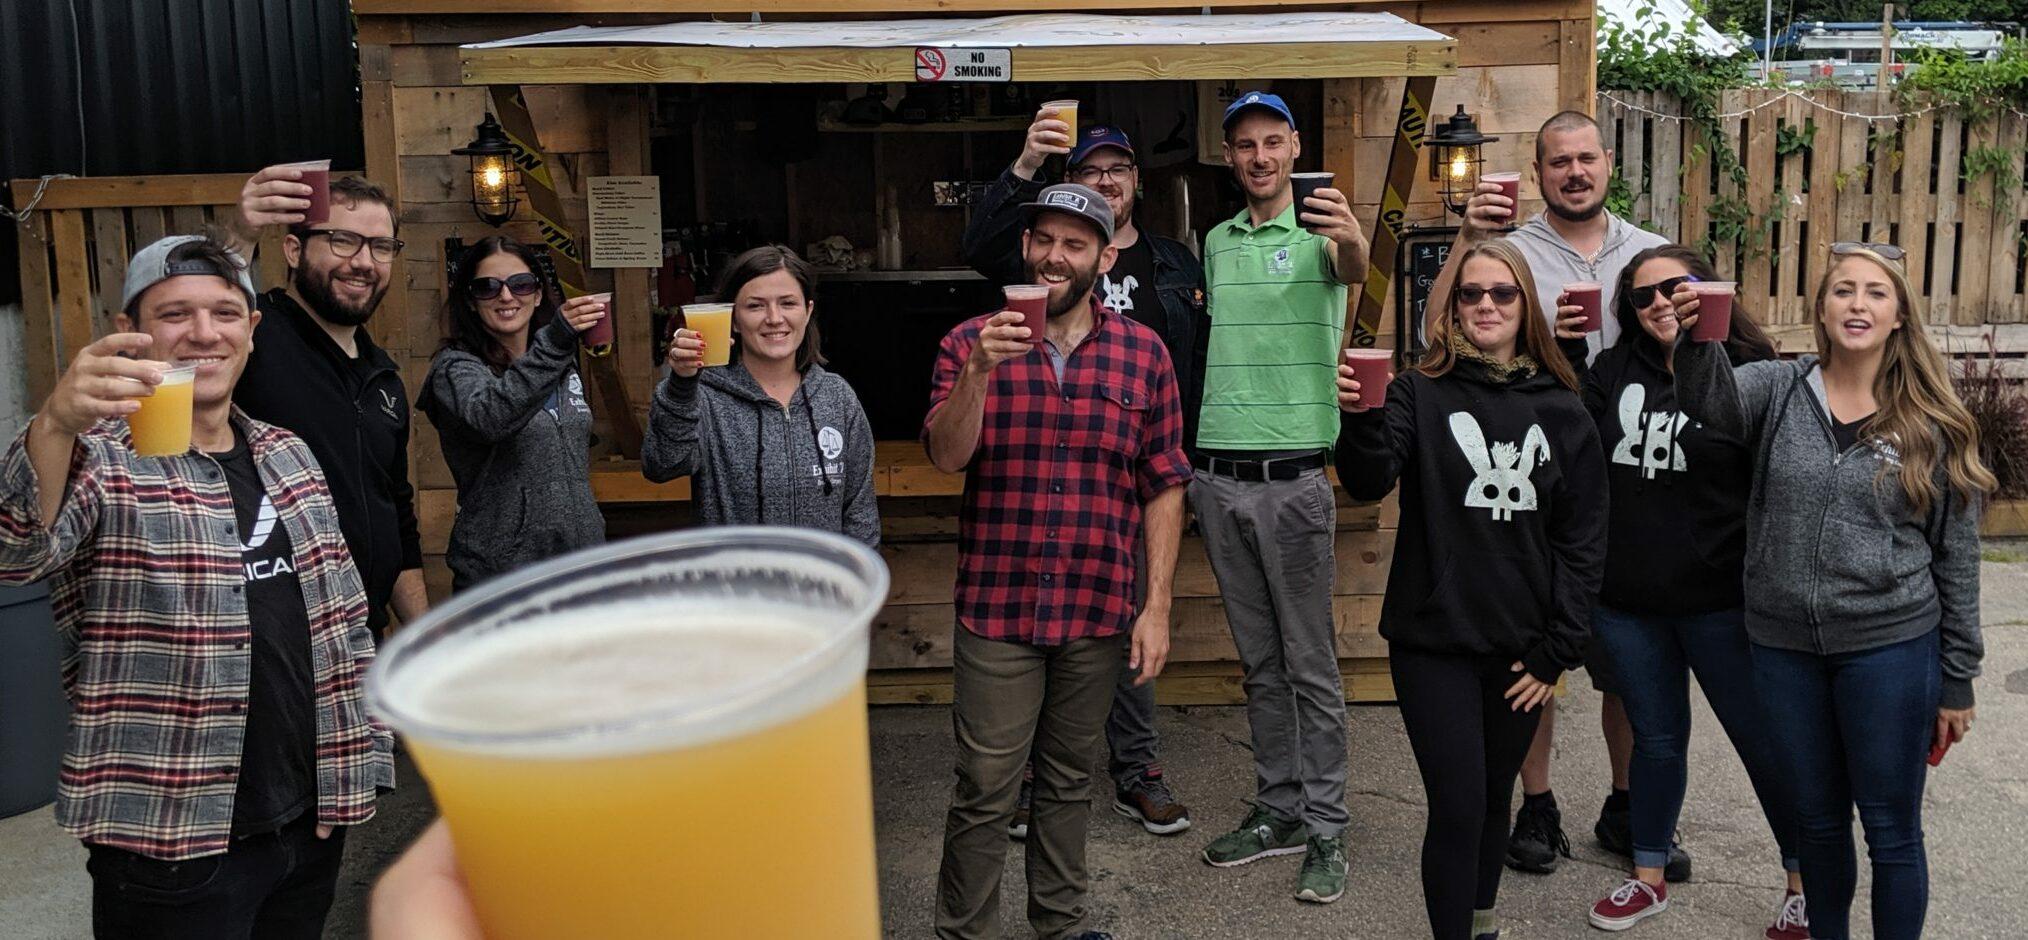 Photo showing the beer garden staff